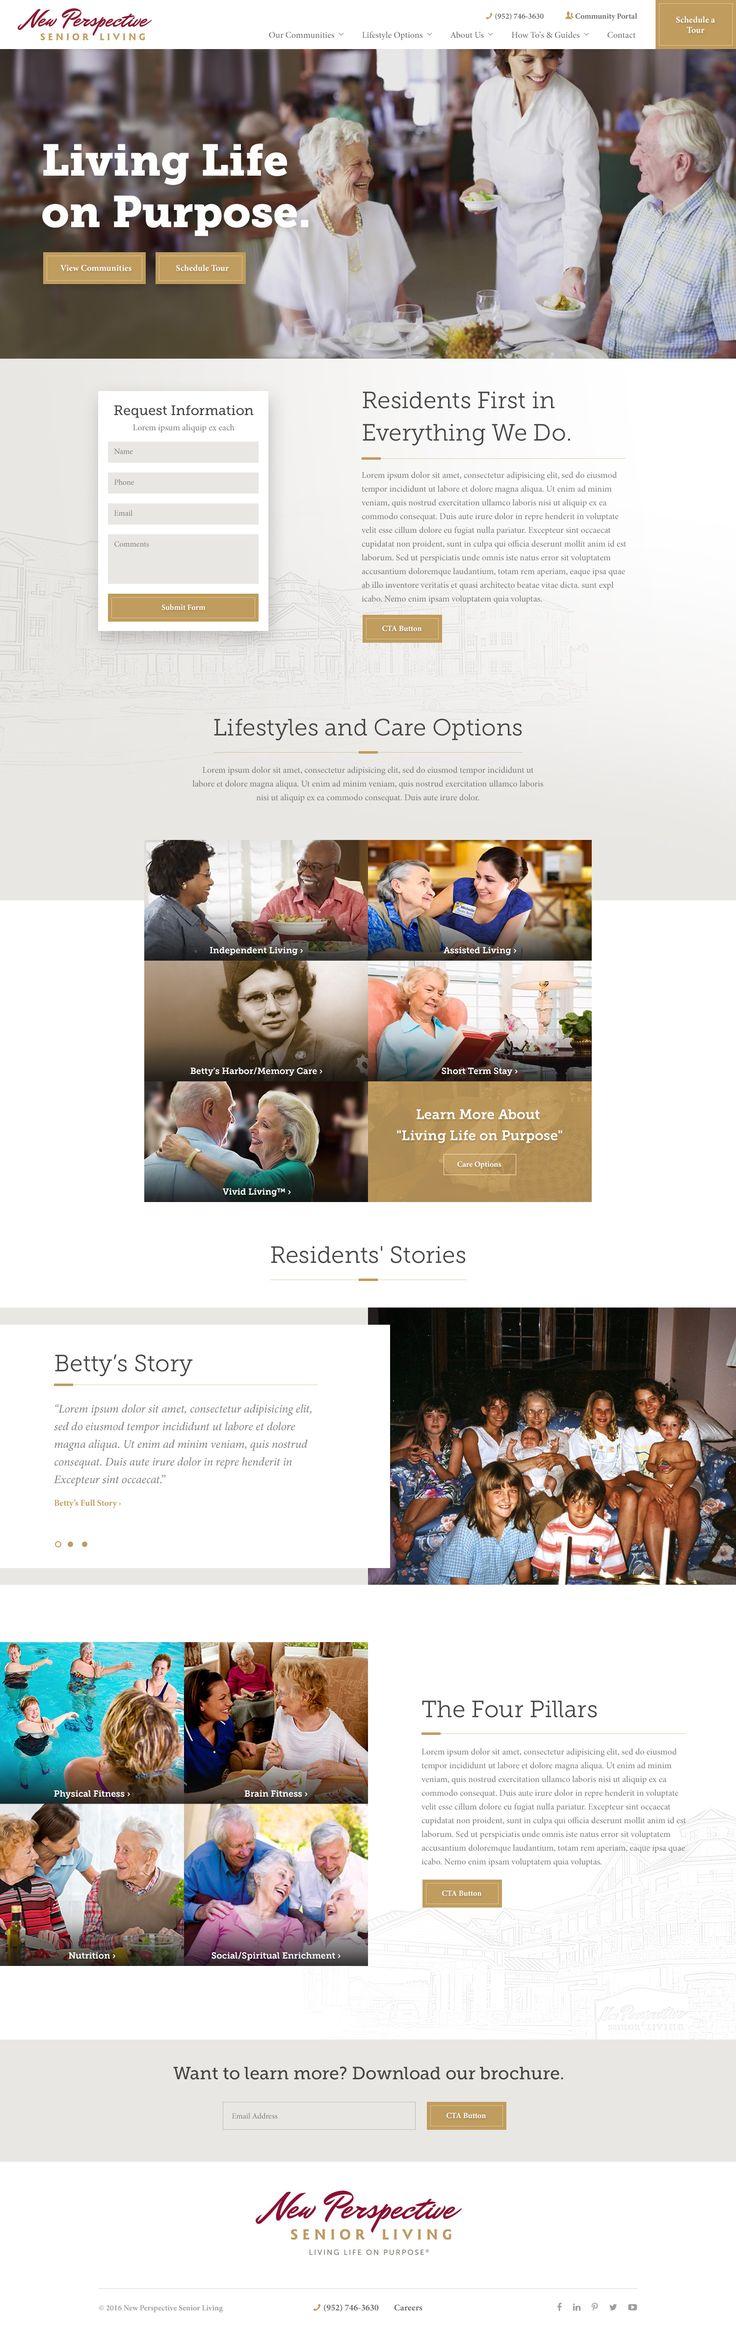 Senior living website design by: Mike Delsing